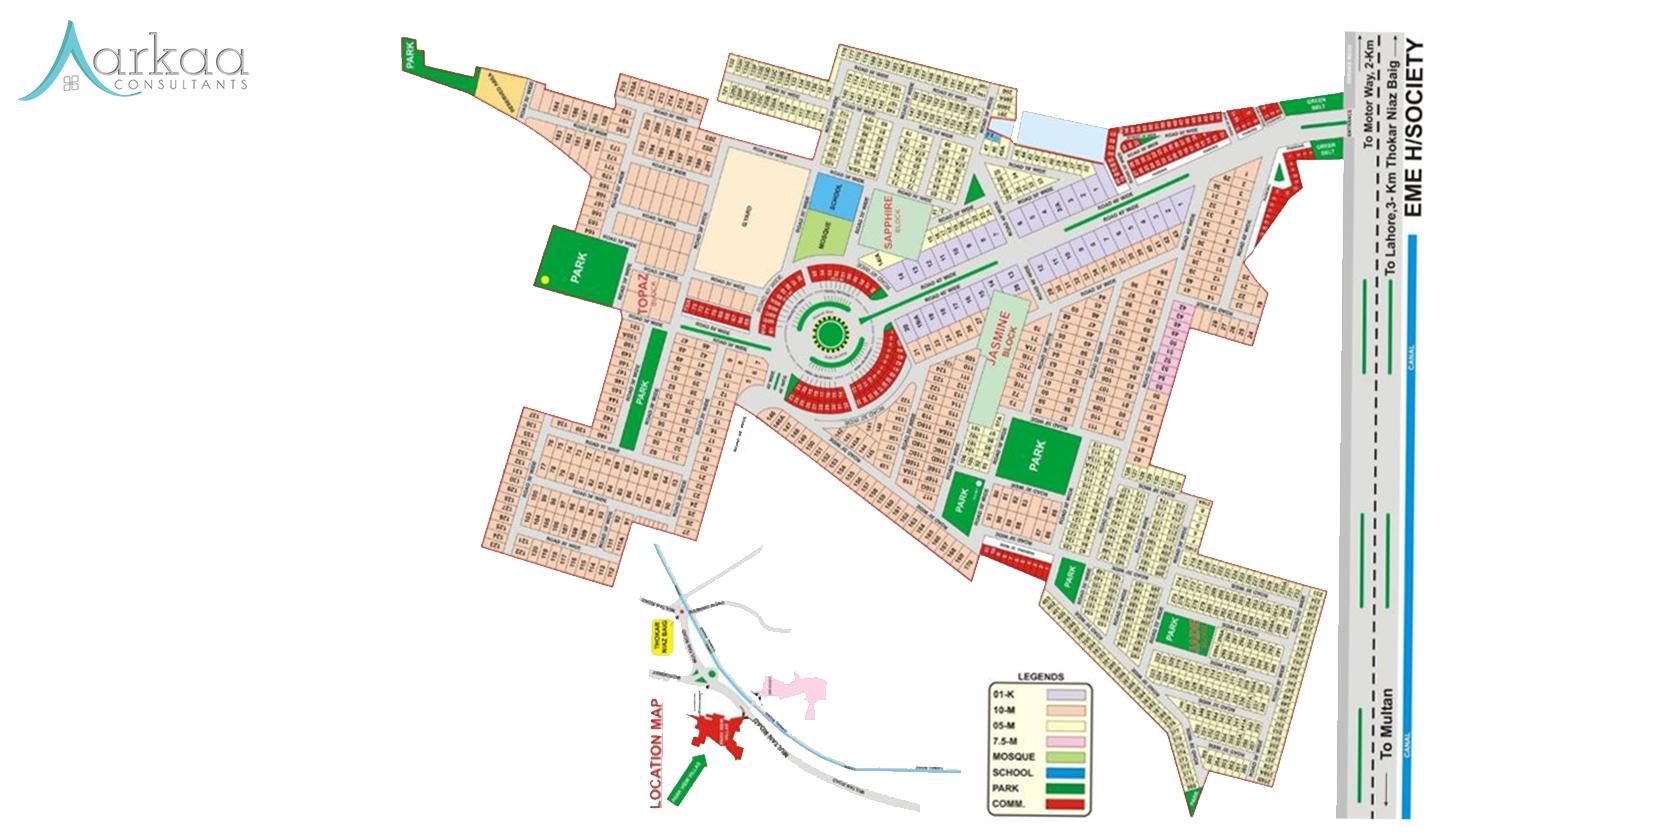 Park View City floor plan